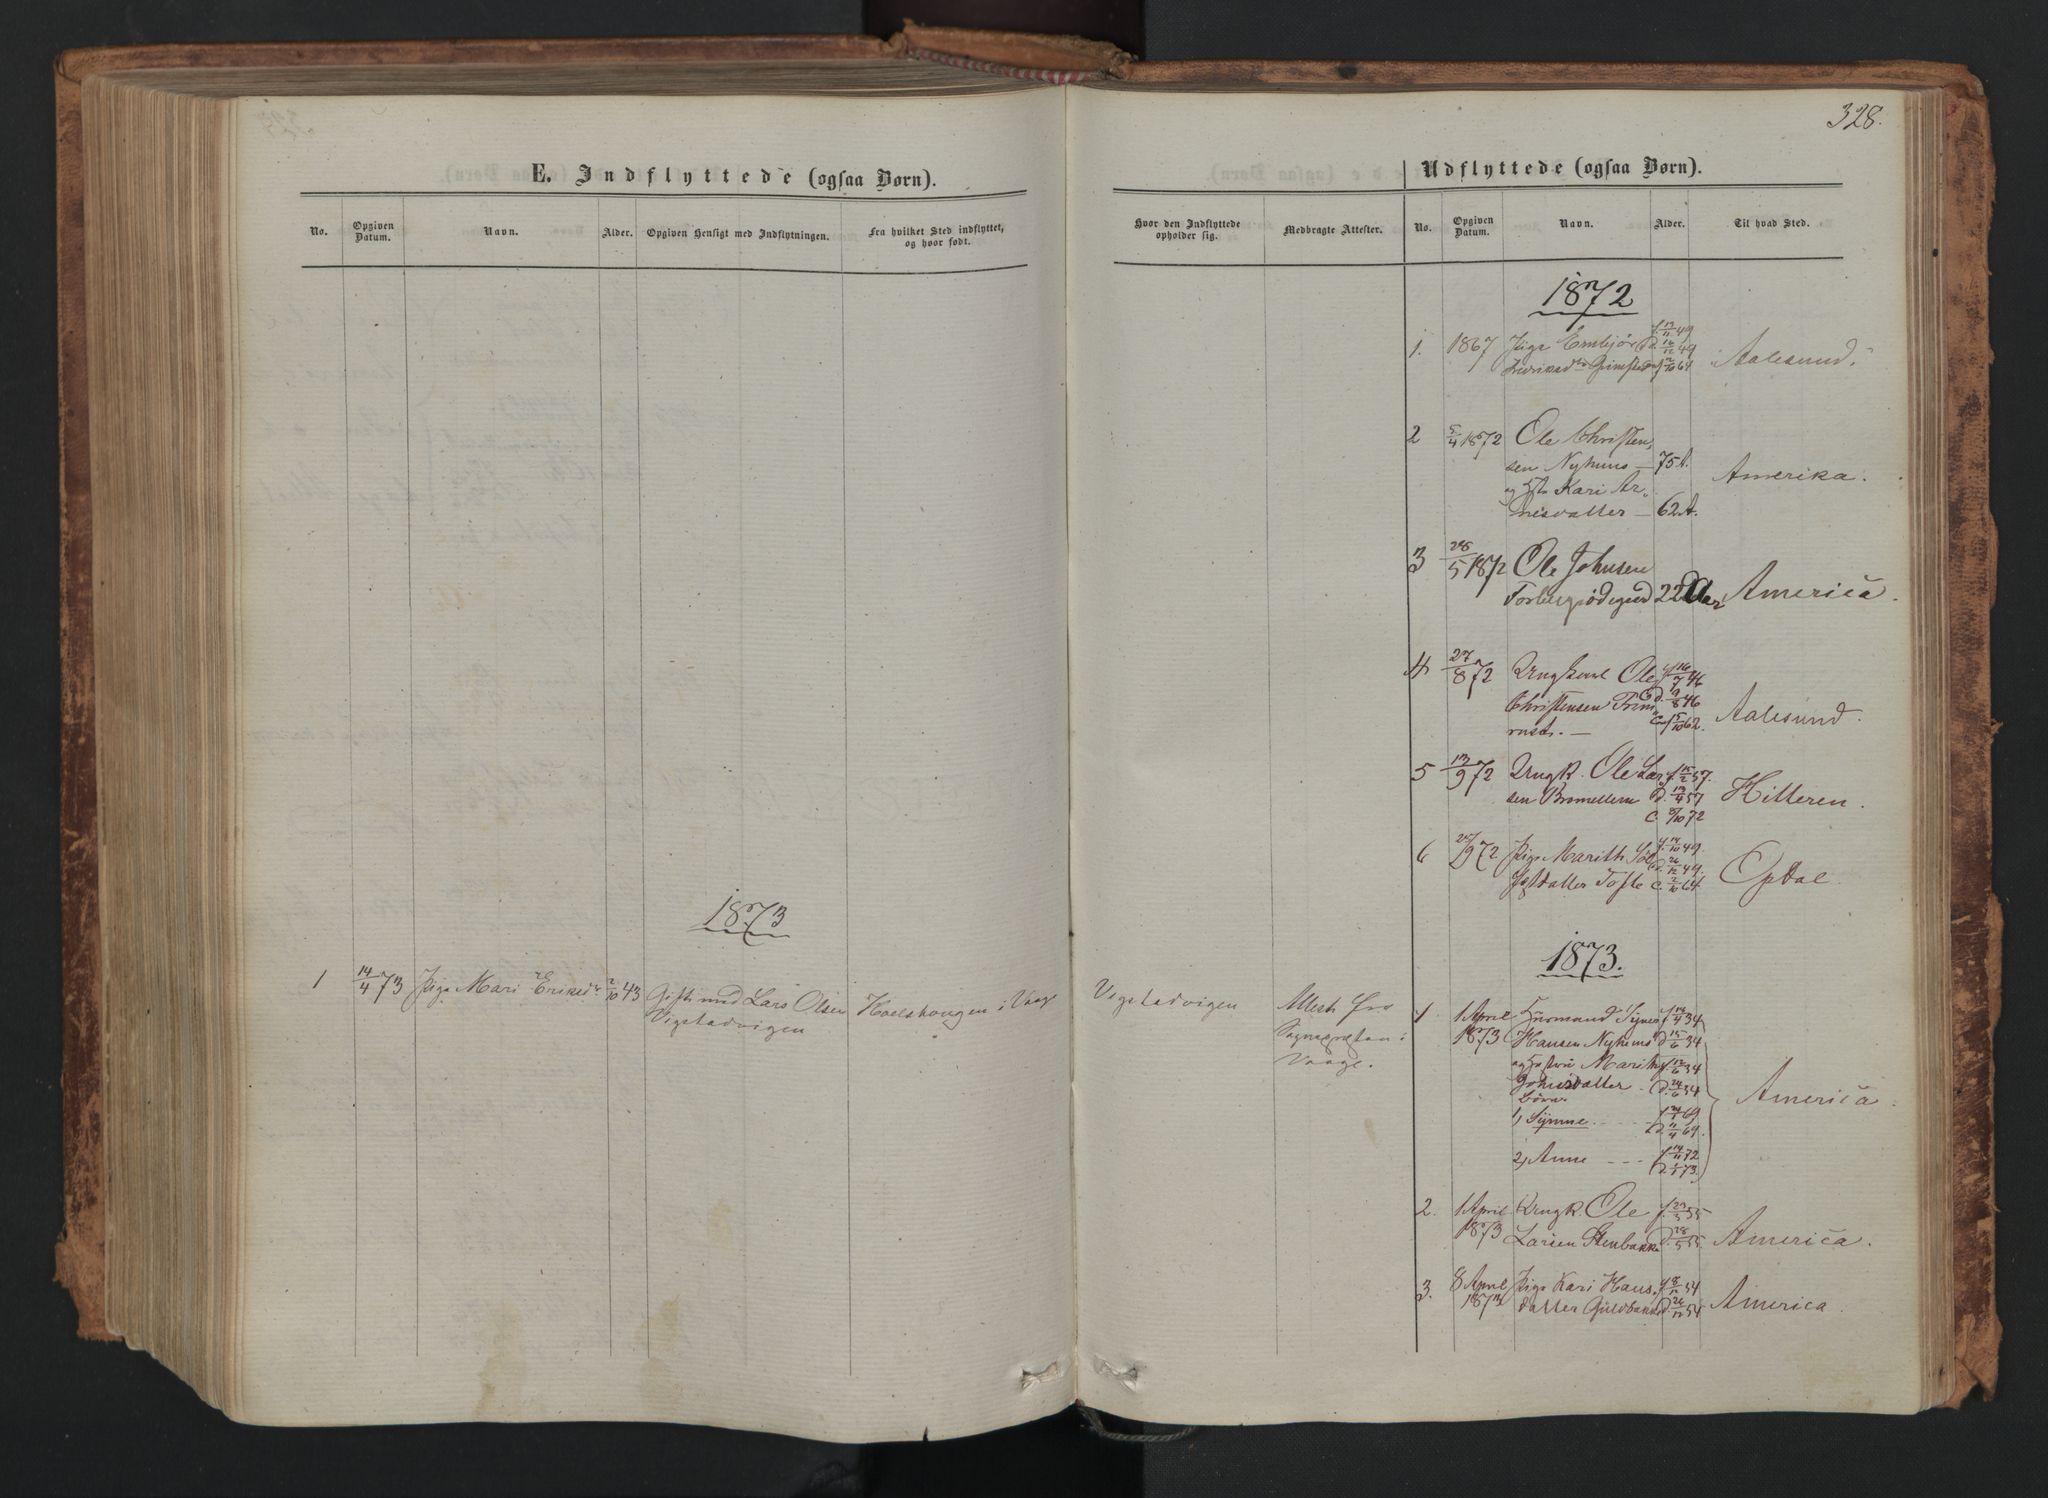 SAH, Skjåk prestekontor, Ministerialbok nr. 1, 1863-1879, s. 328